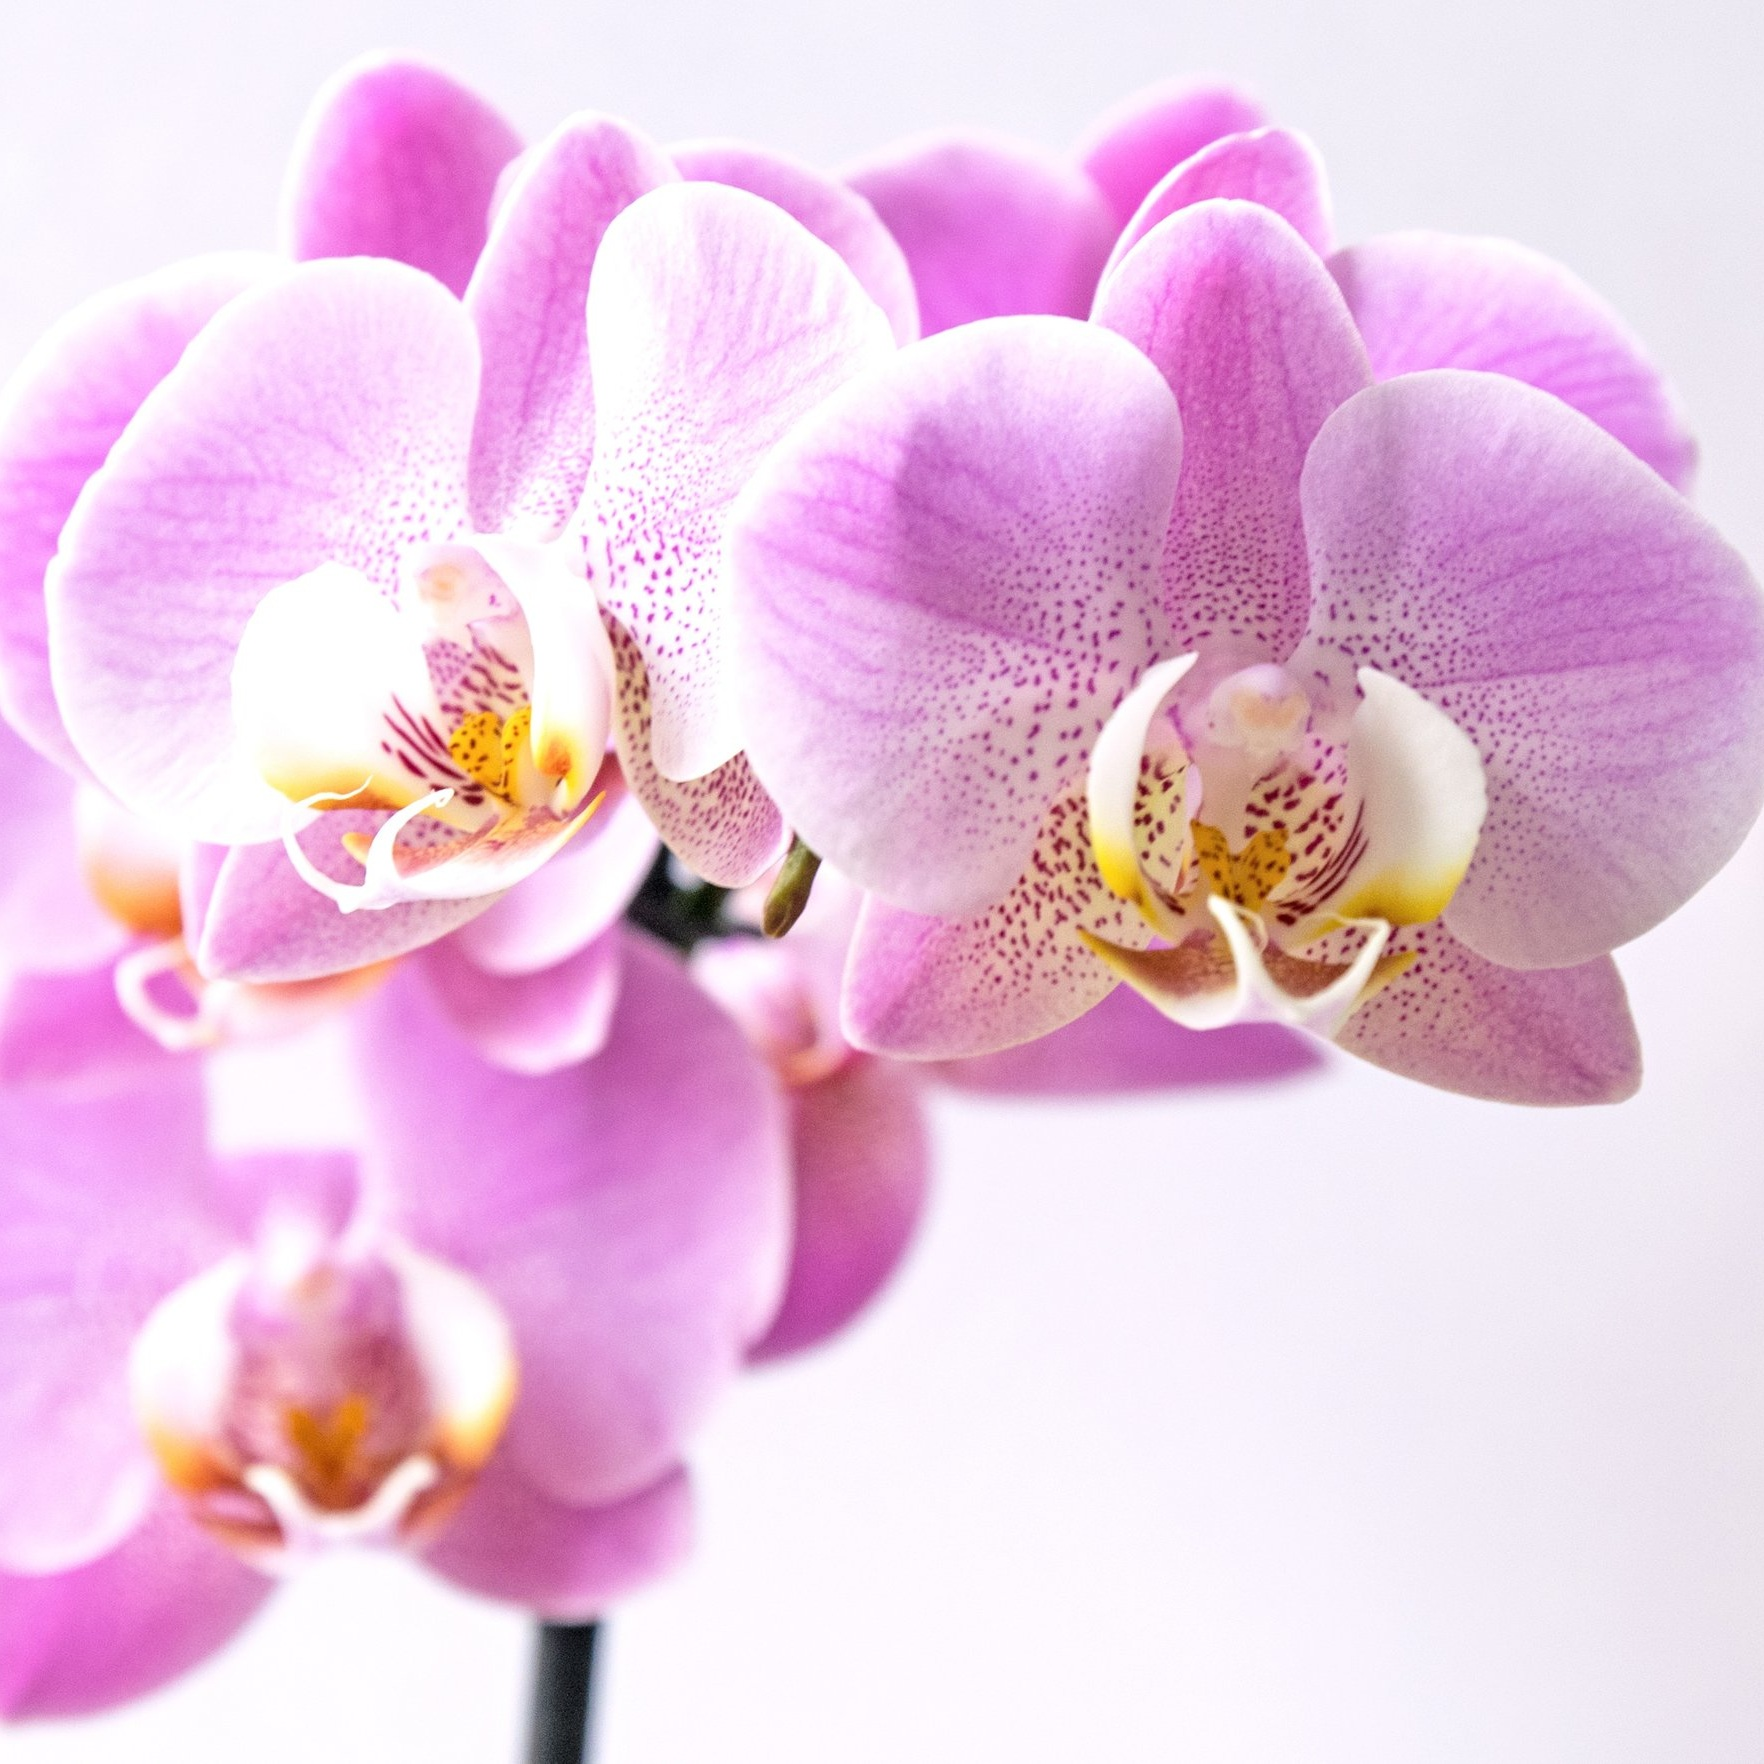 Orquídea - Phalaenopsis